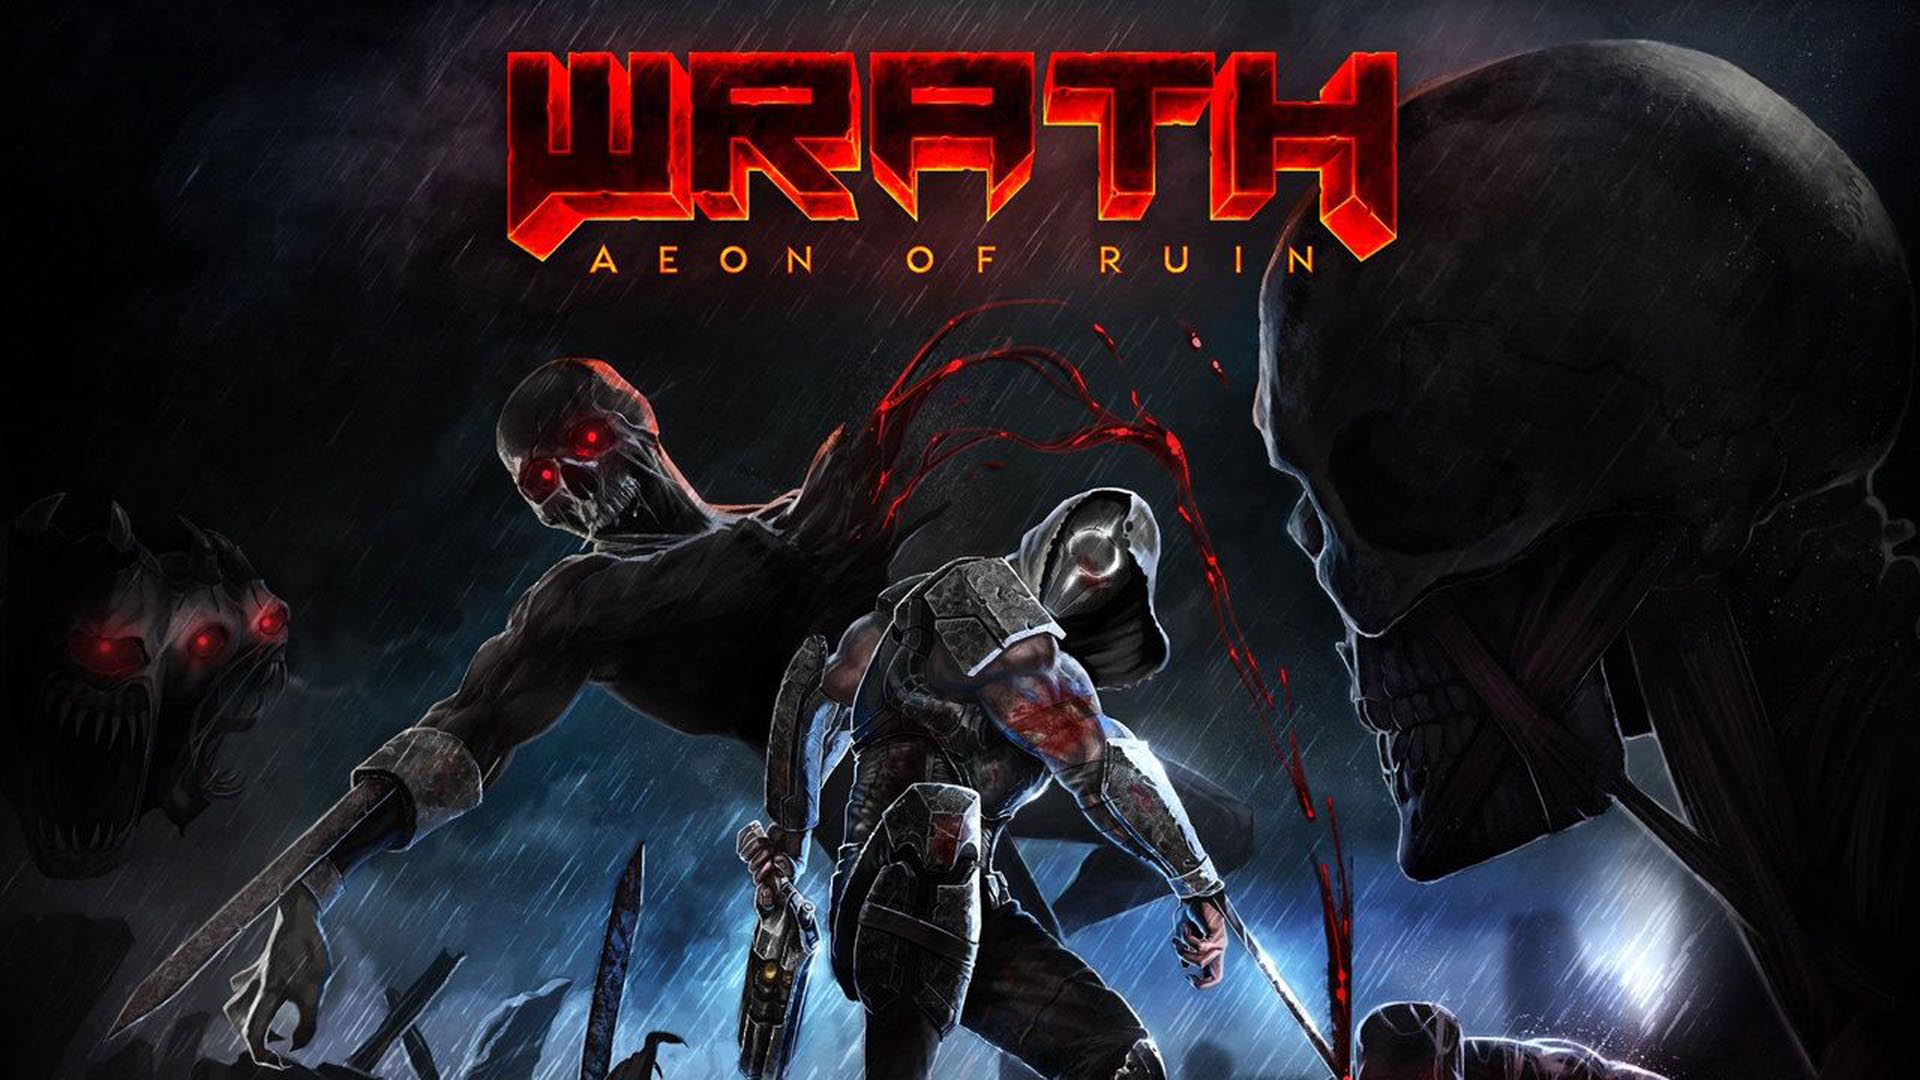 Wrath: Aeon of Ruin Cover